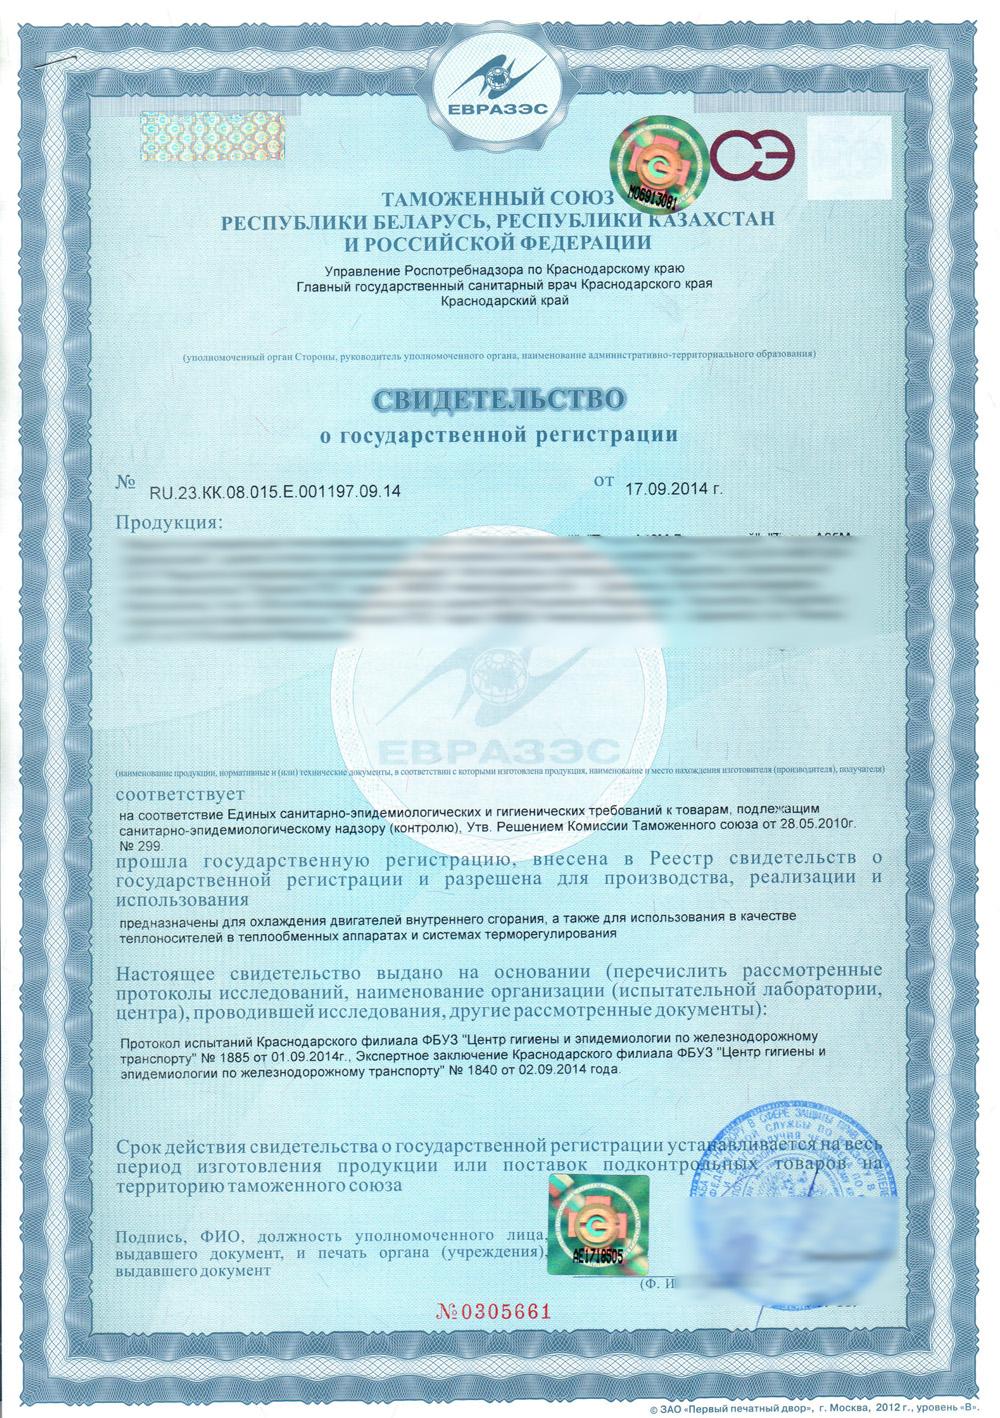 схема сертификации 5 содержит